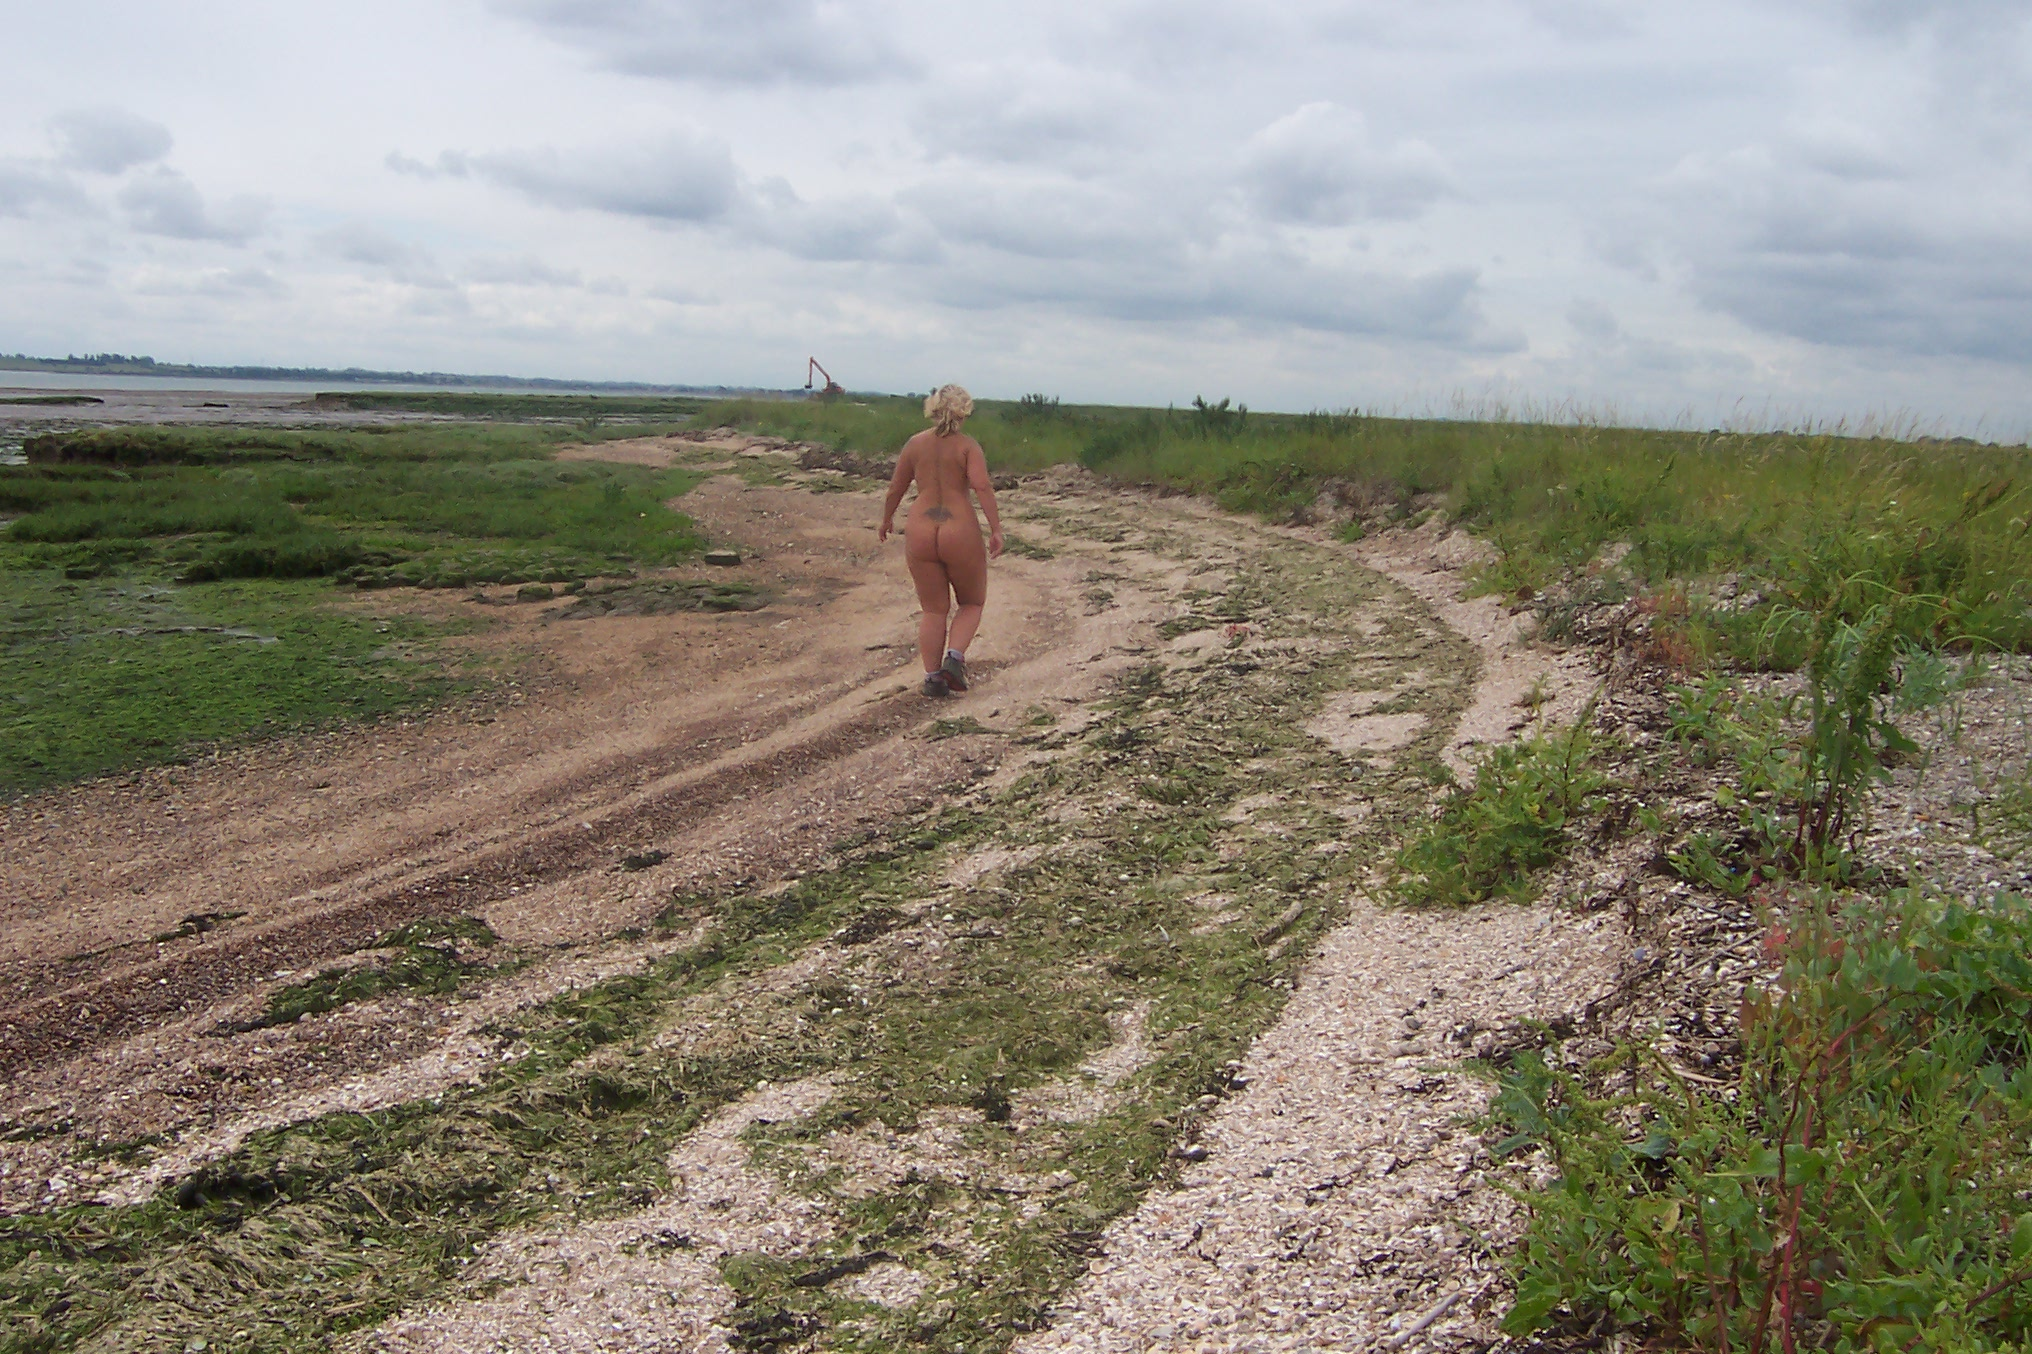 Essex nudist beach